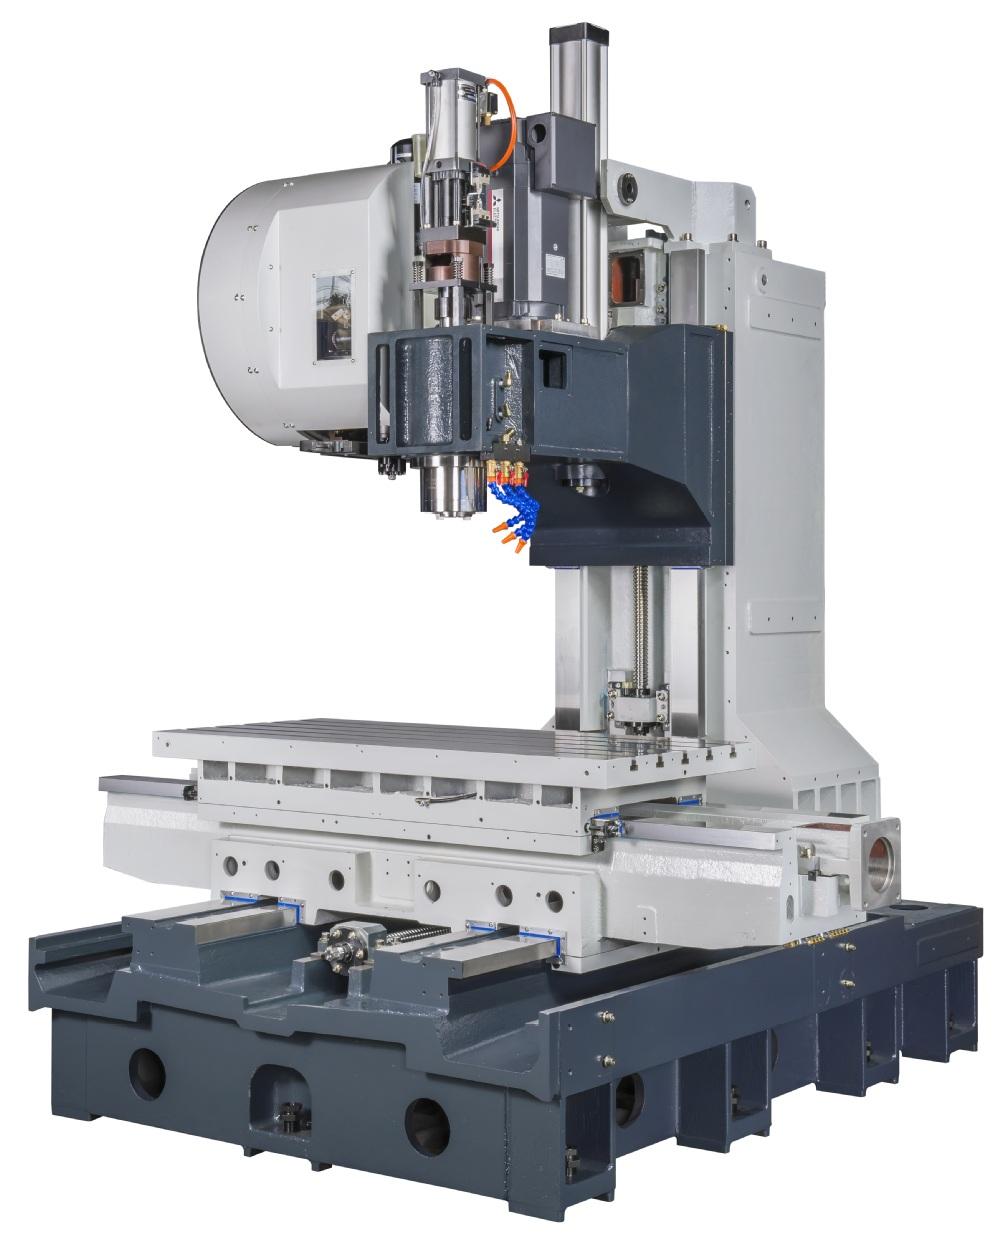 3 Axis CNC Vertical Milling Machine NVM-1166